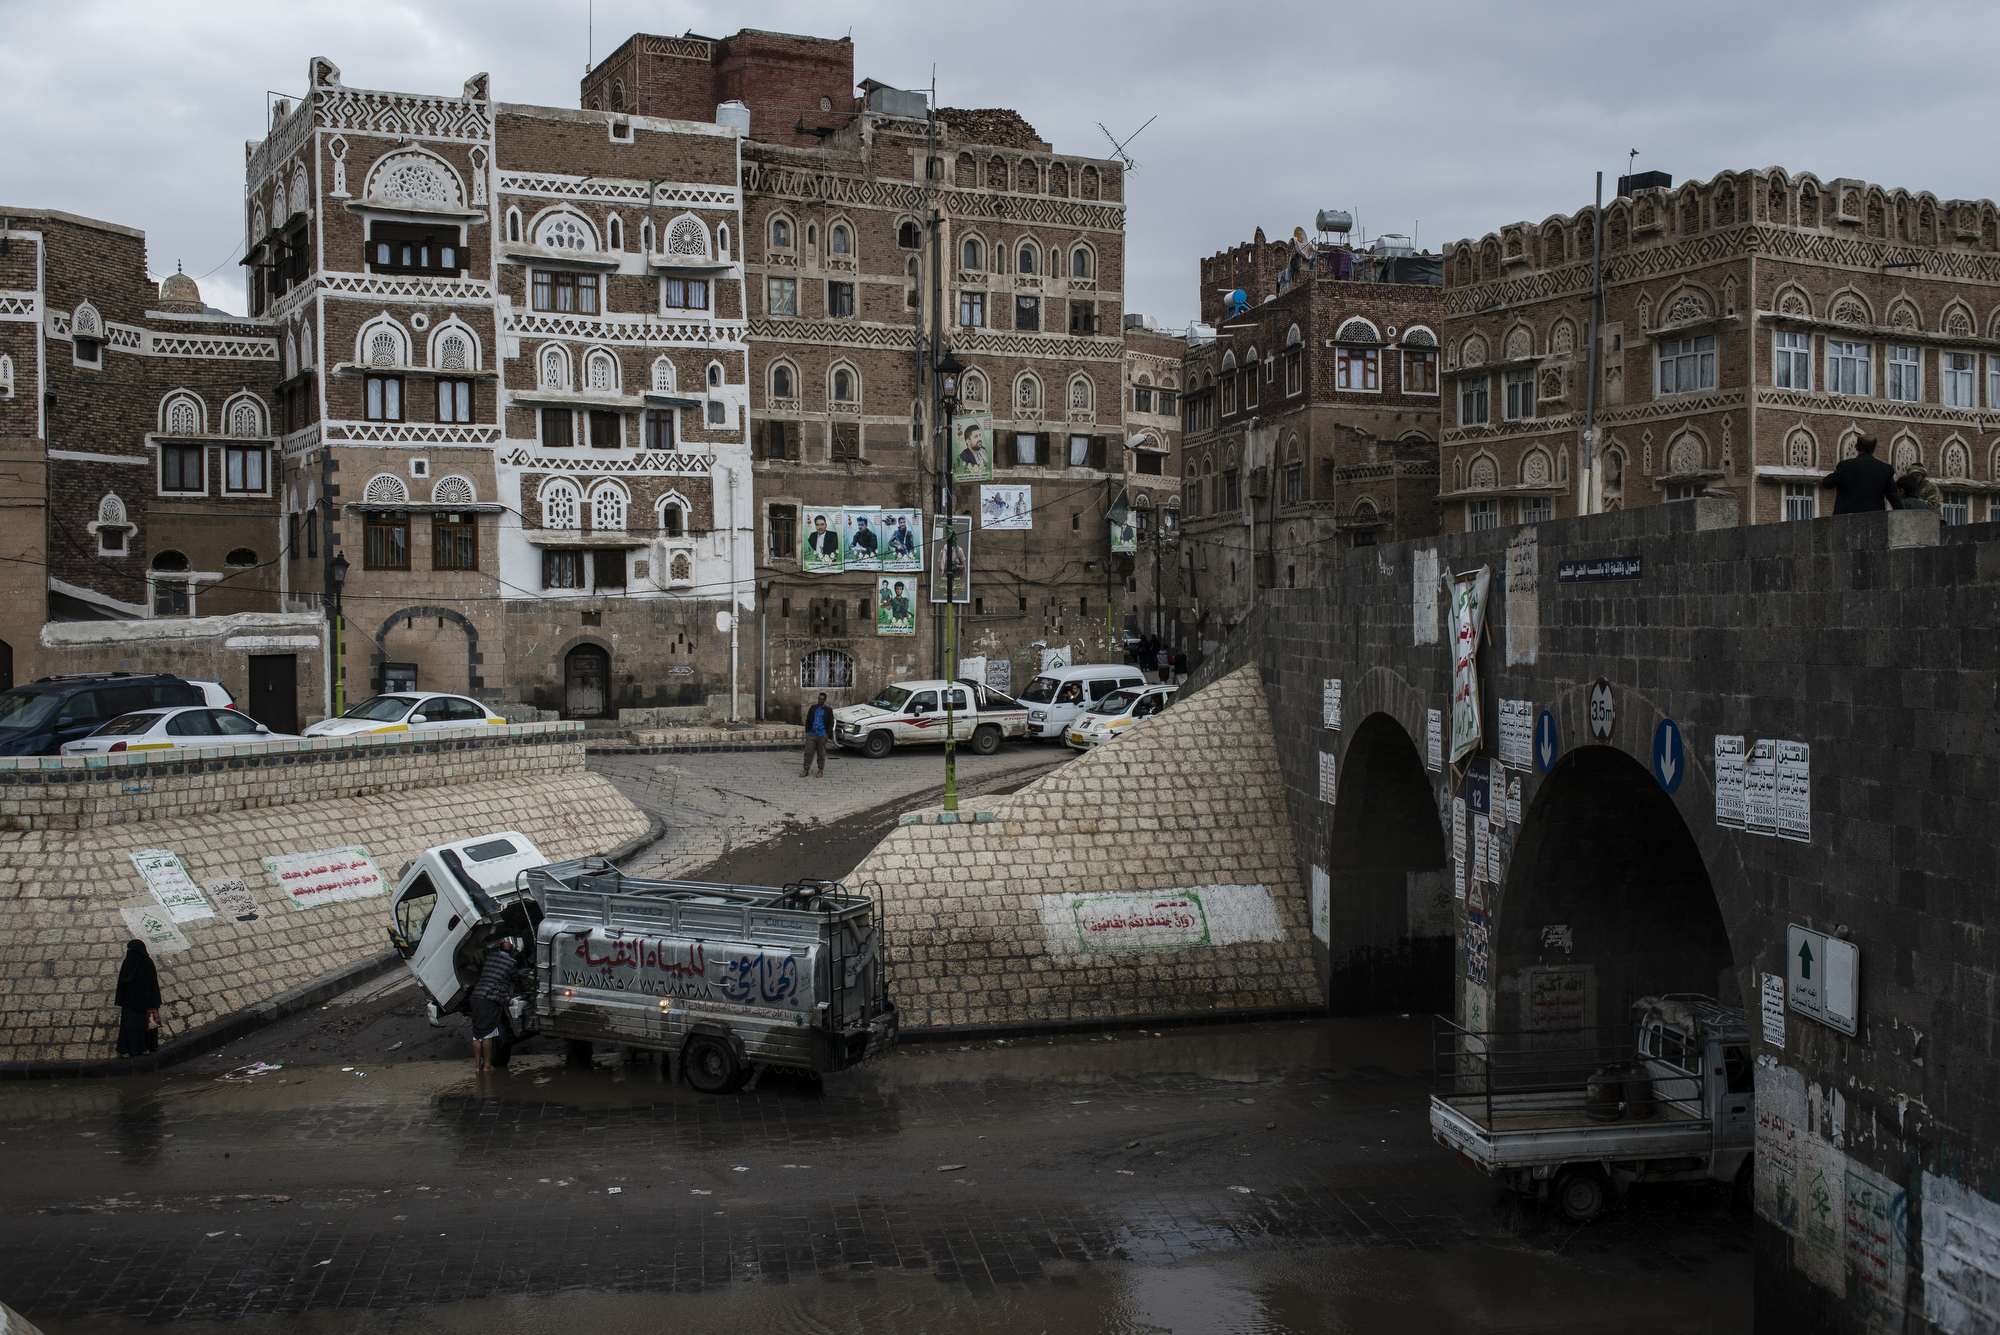 AlexPotter_Yemen_InterceptHealth_ContextPhotos_31.JPG